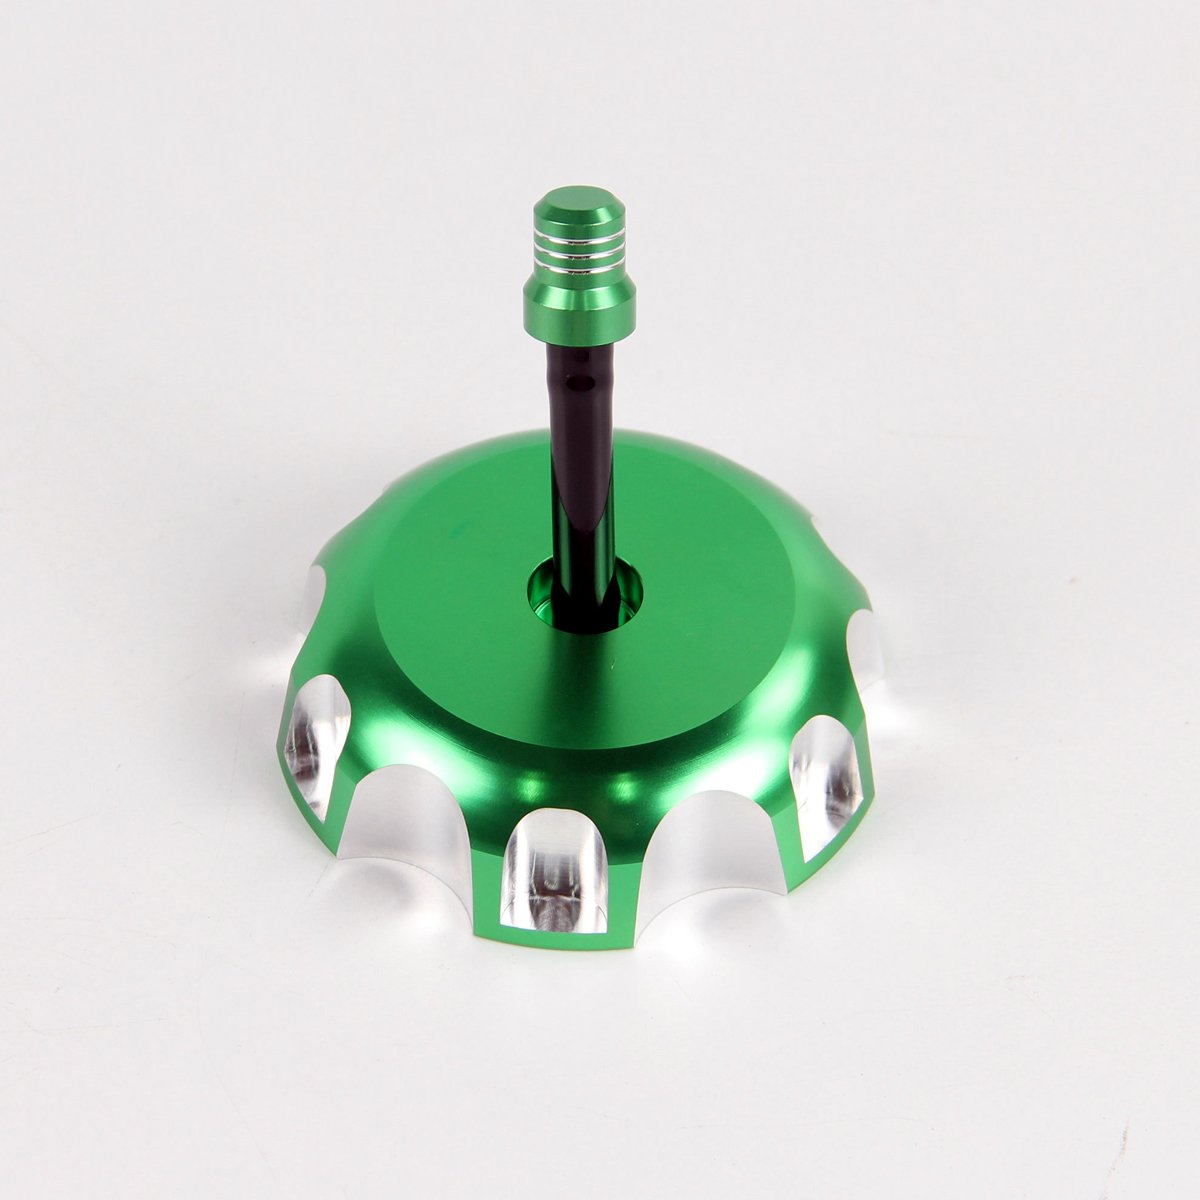 Green Billet Gas Fuel Tank Cap Cover with Vent Hose for Kawasaki KX 250 250F 450F KLX450R KFX 450R